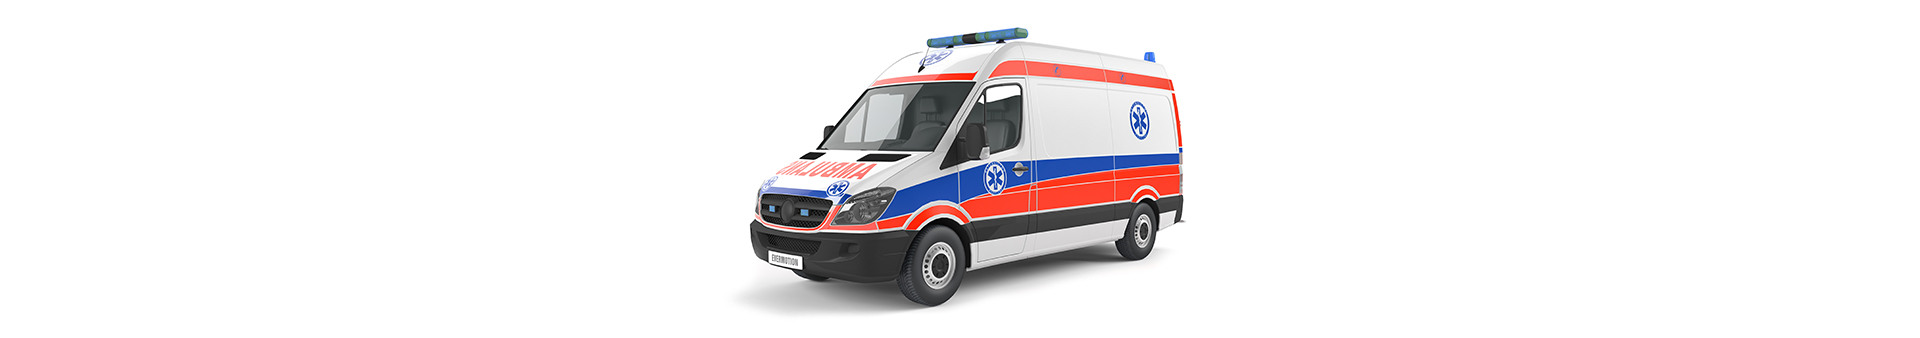 negative pressure ambulance